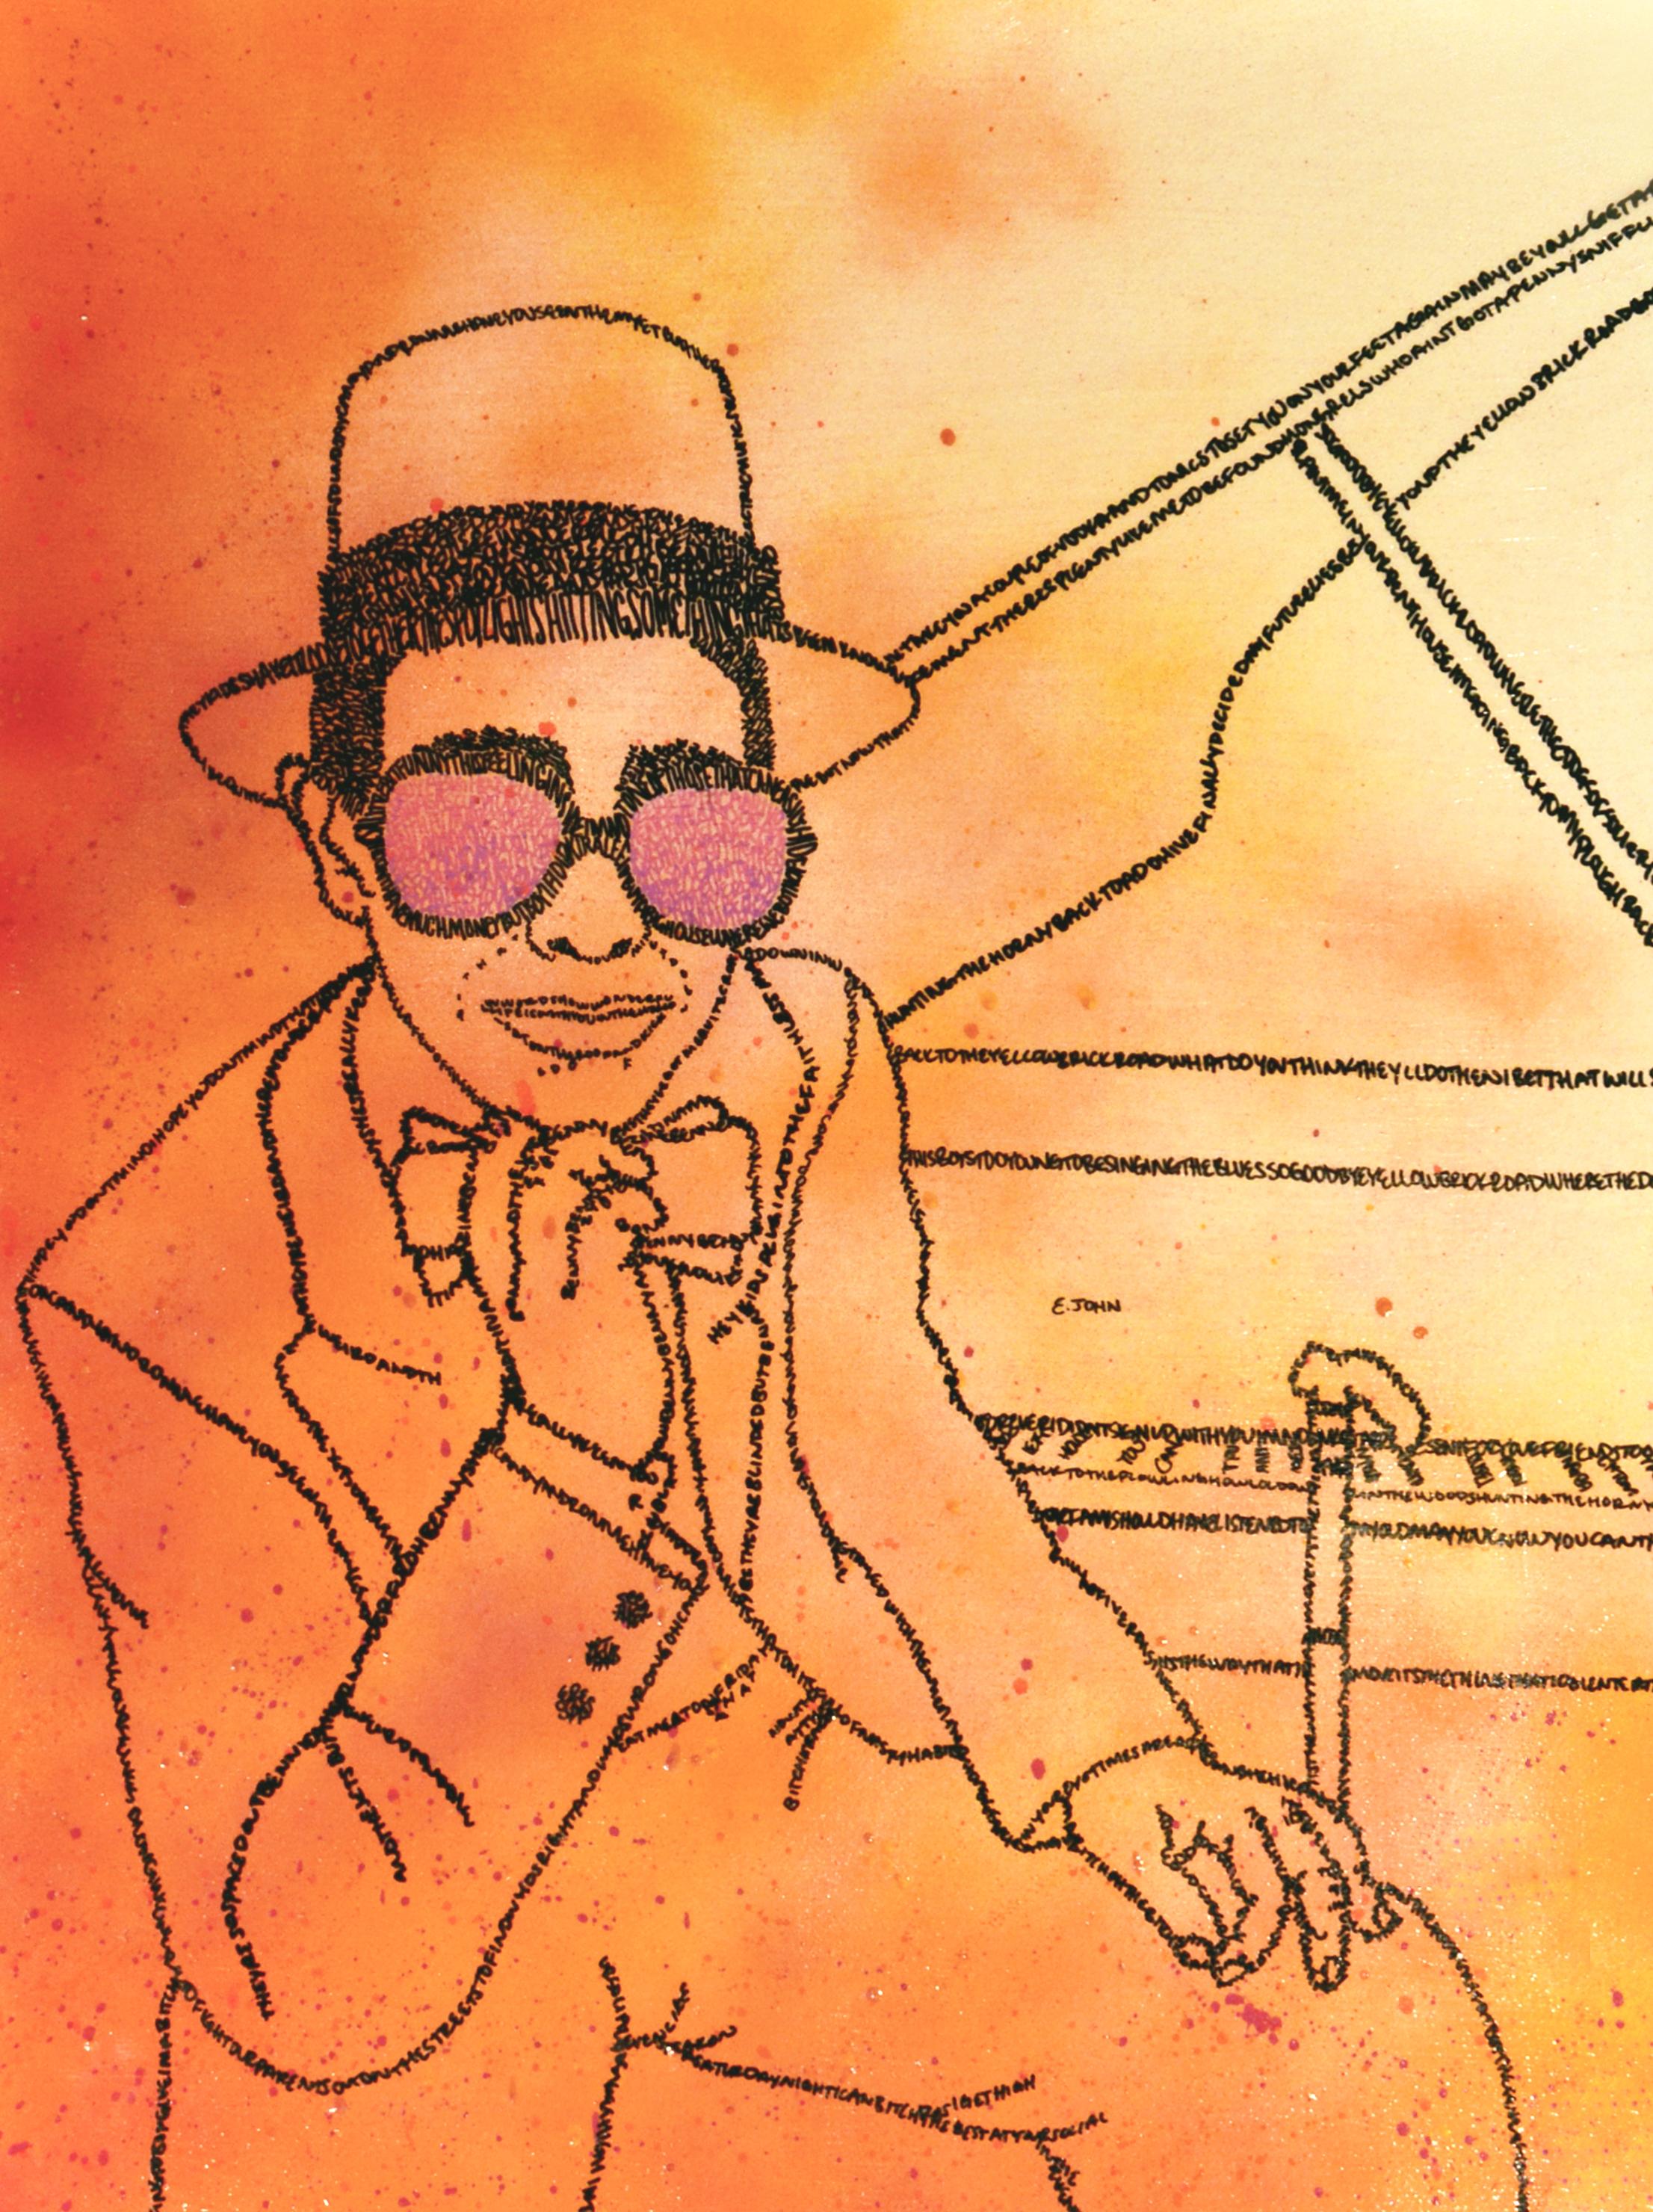 Lee Elton John 2 on paper 22x30